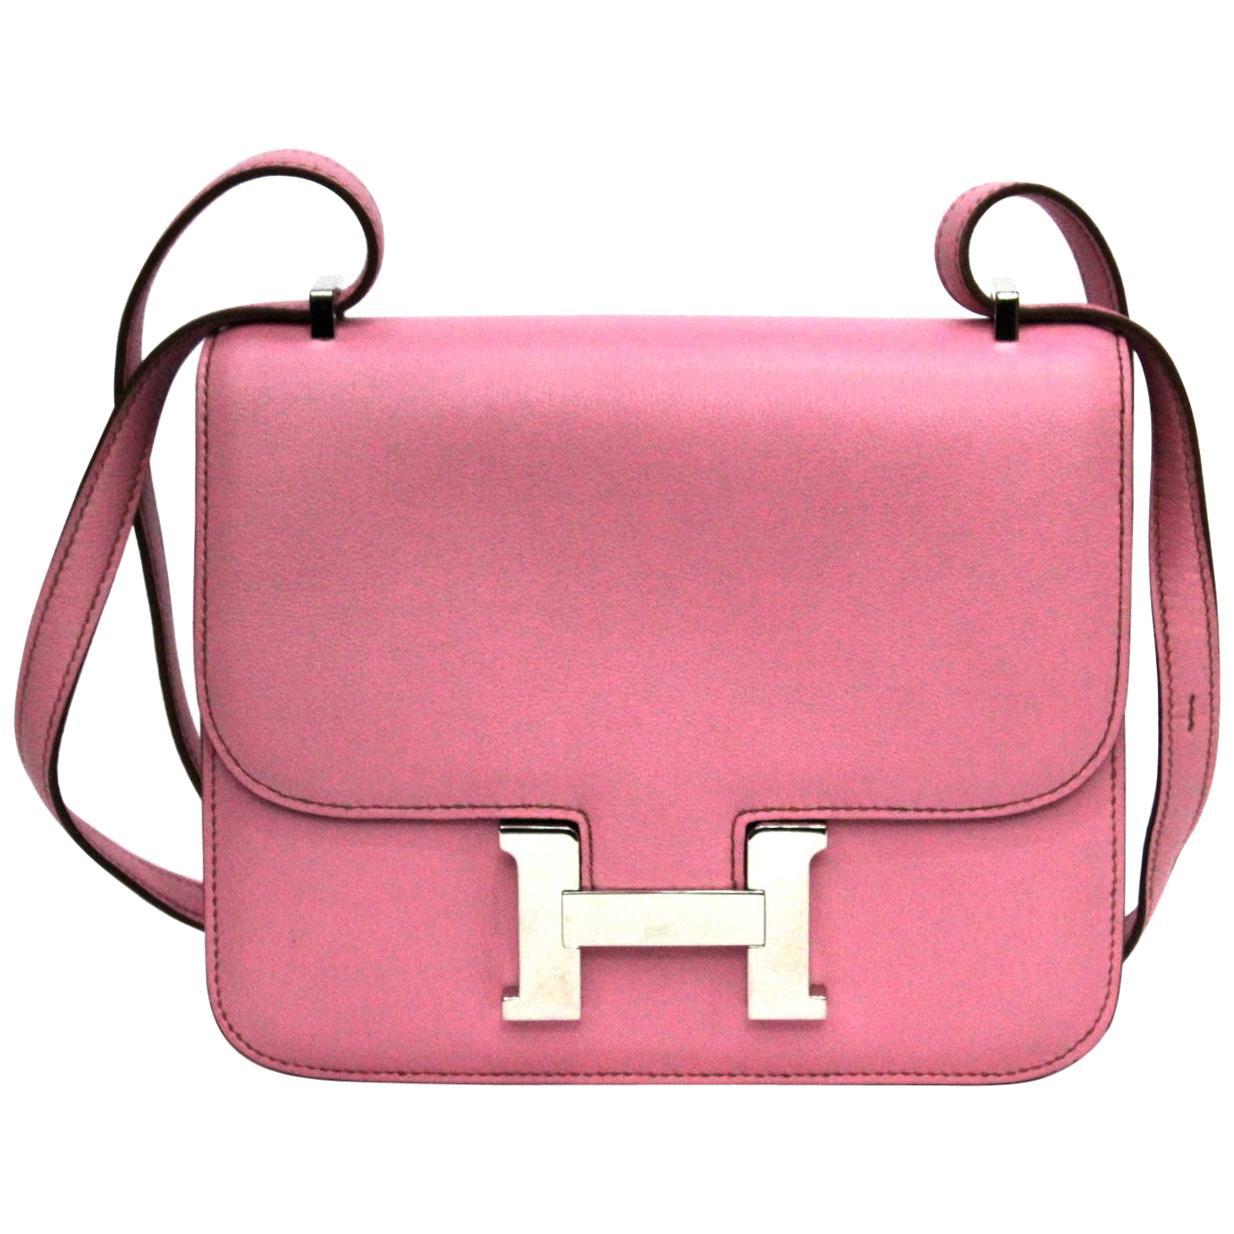 Hermès Costance Mini Swift Pink Leather